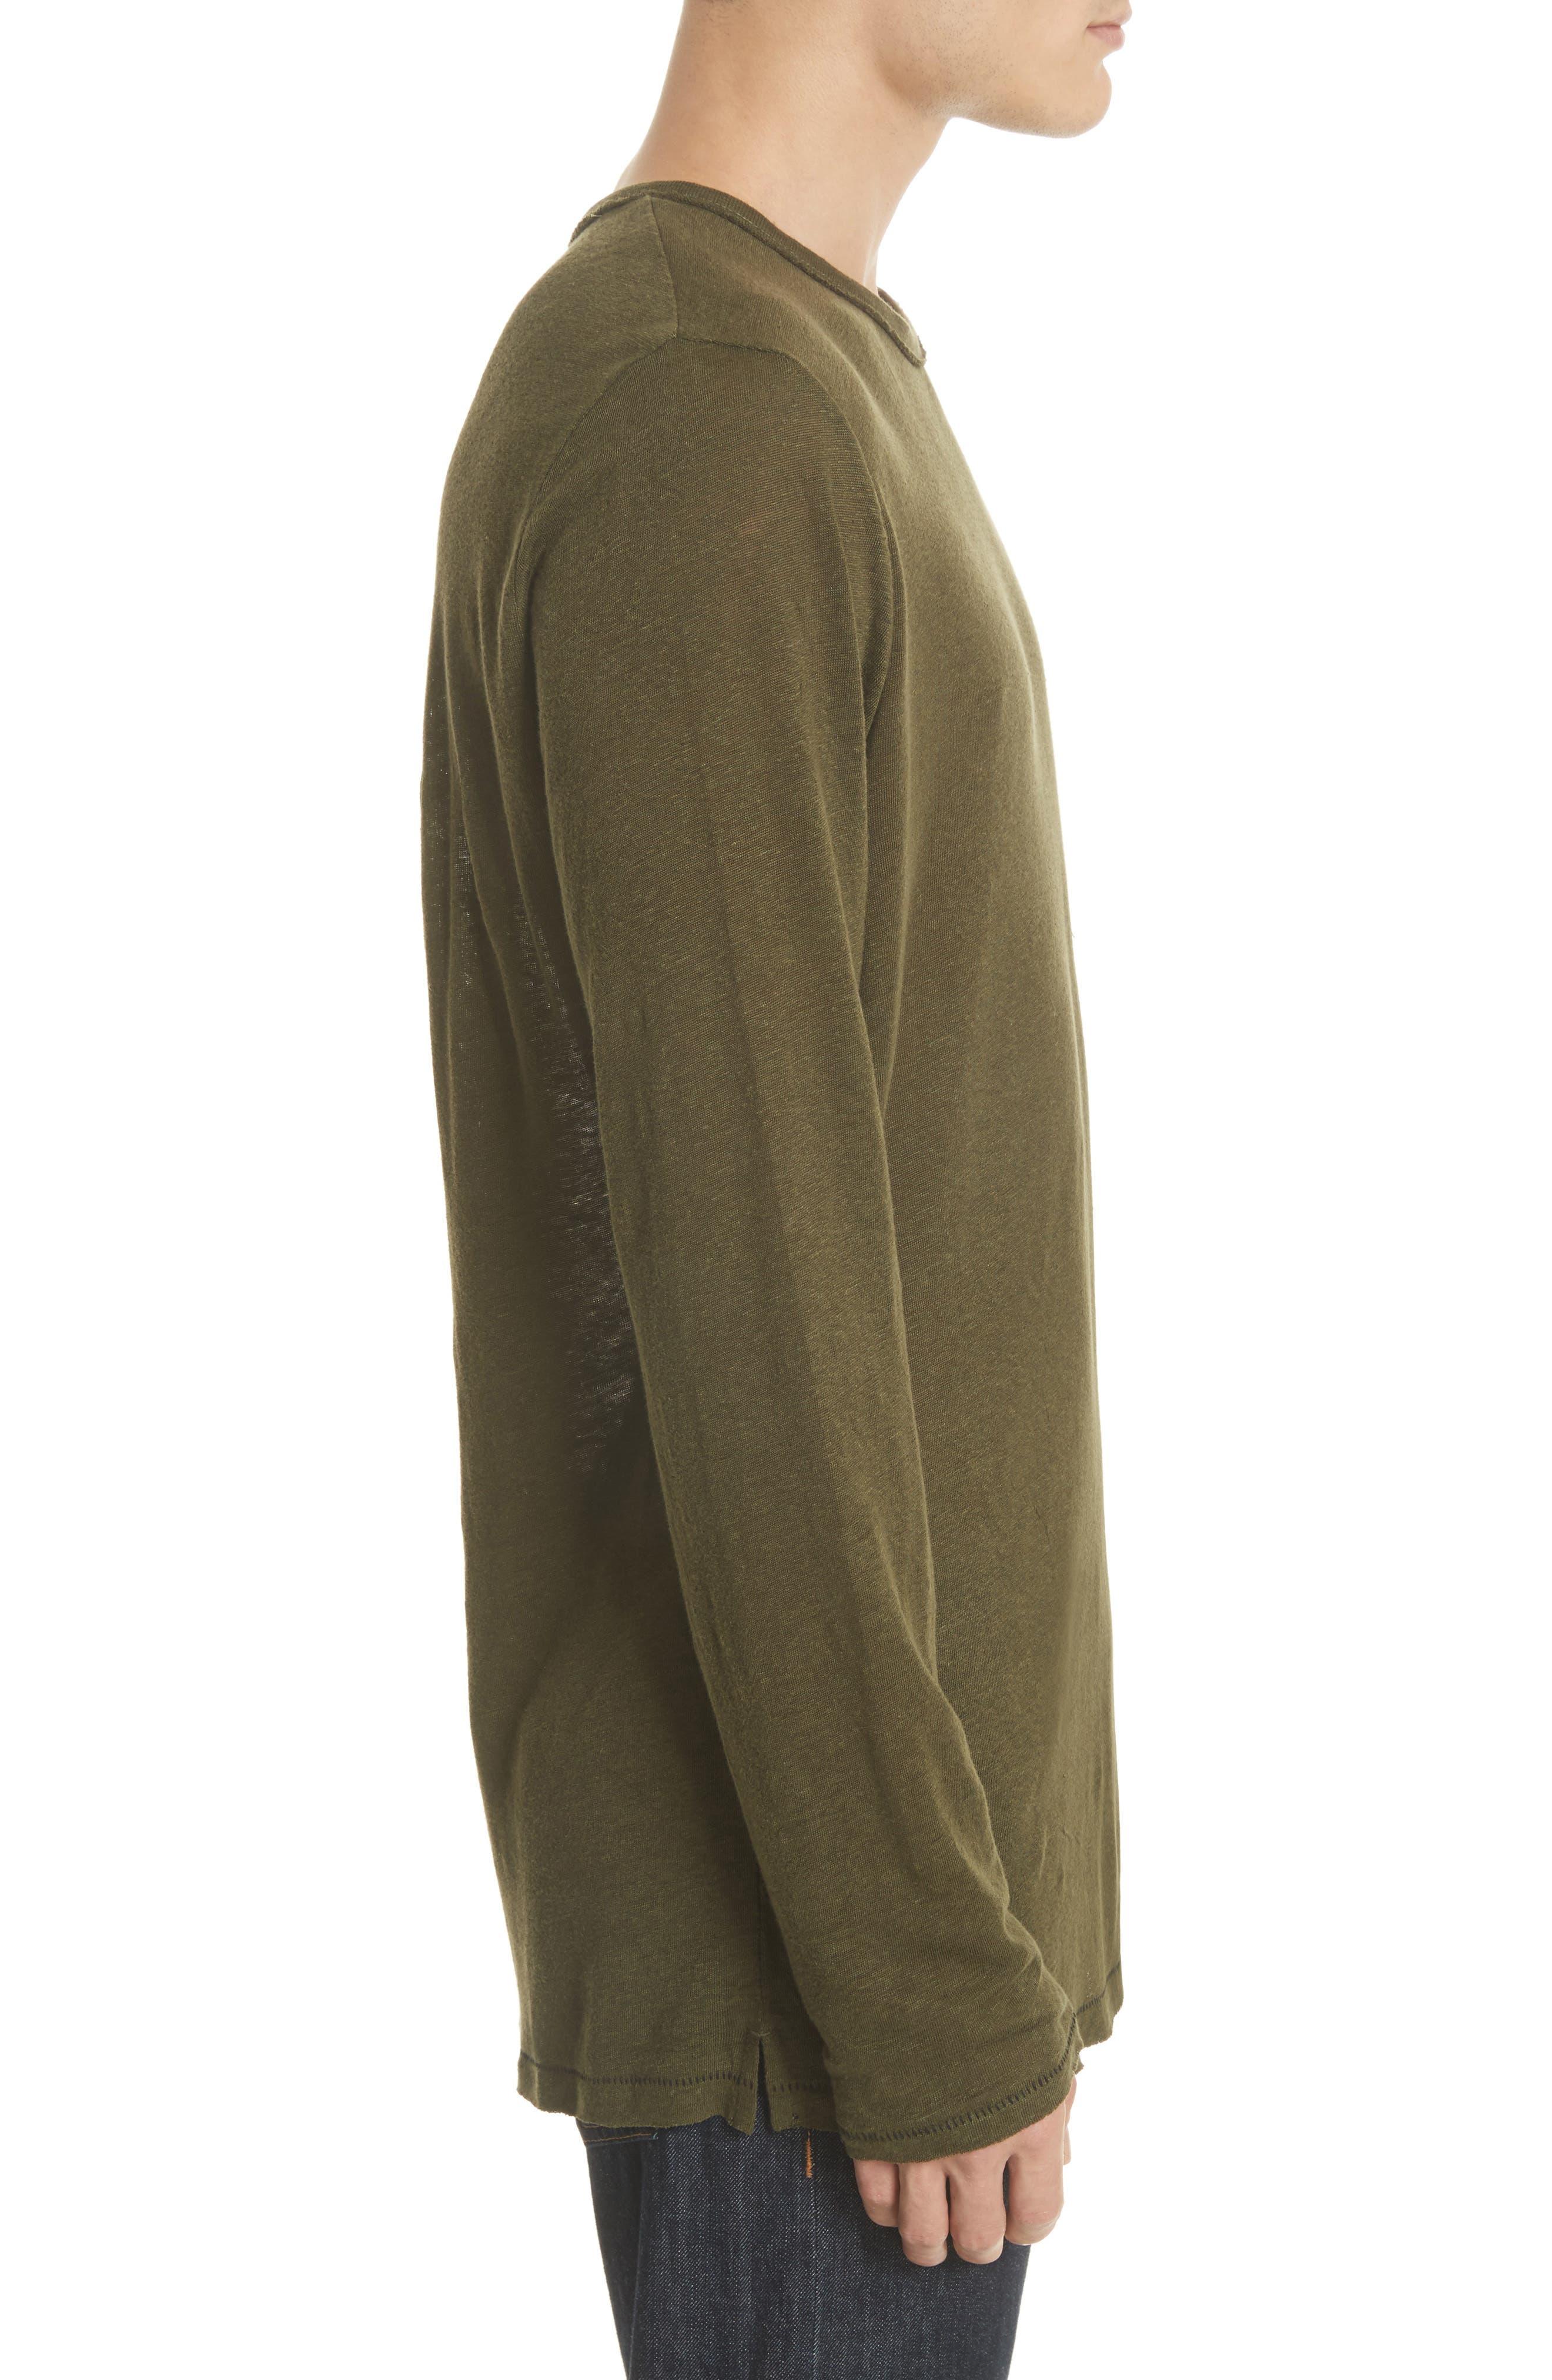 Owen Long Sleeve T-Shirt,                             Alternate thumbnail 3, color,                             319